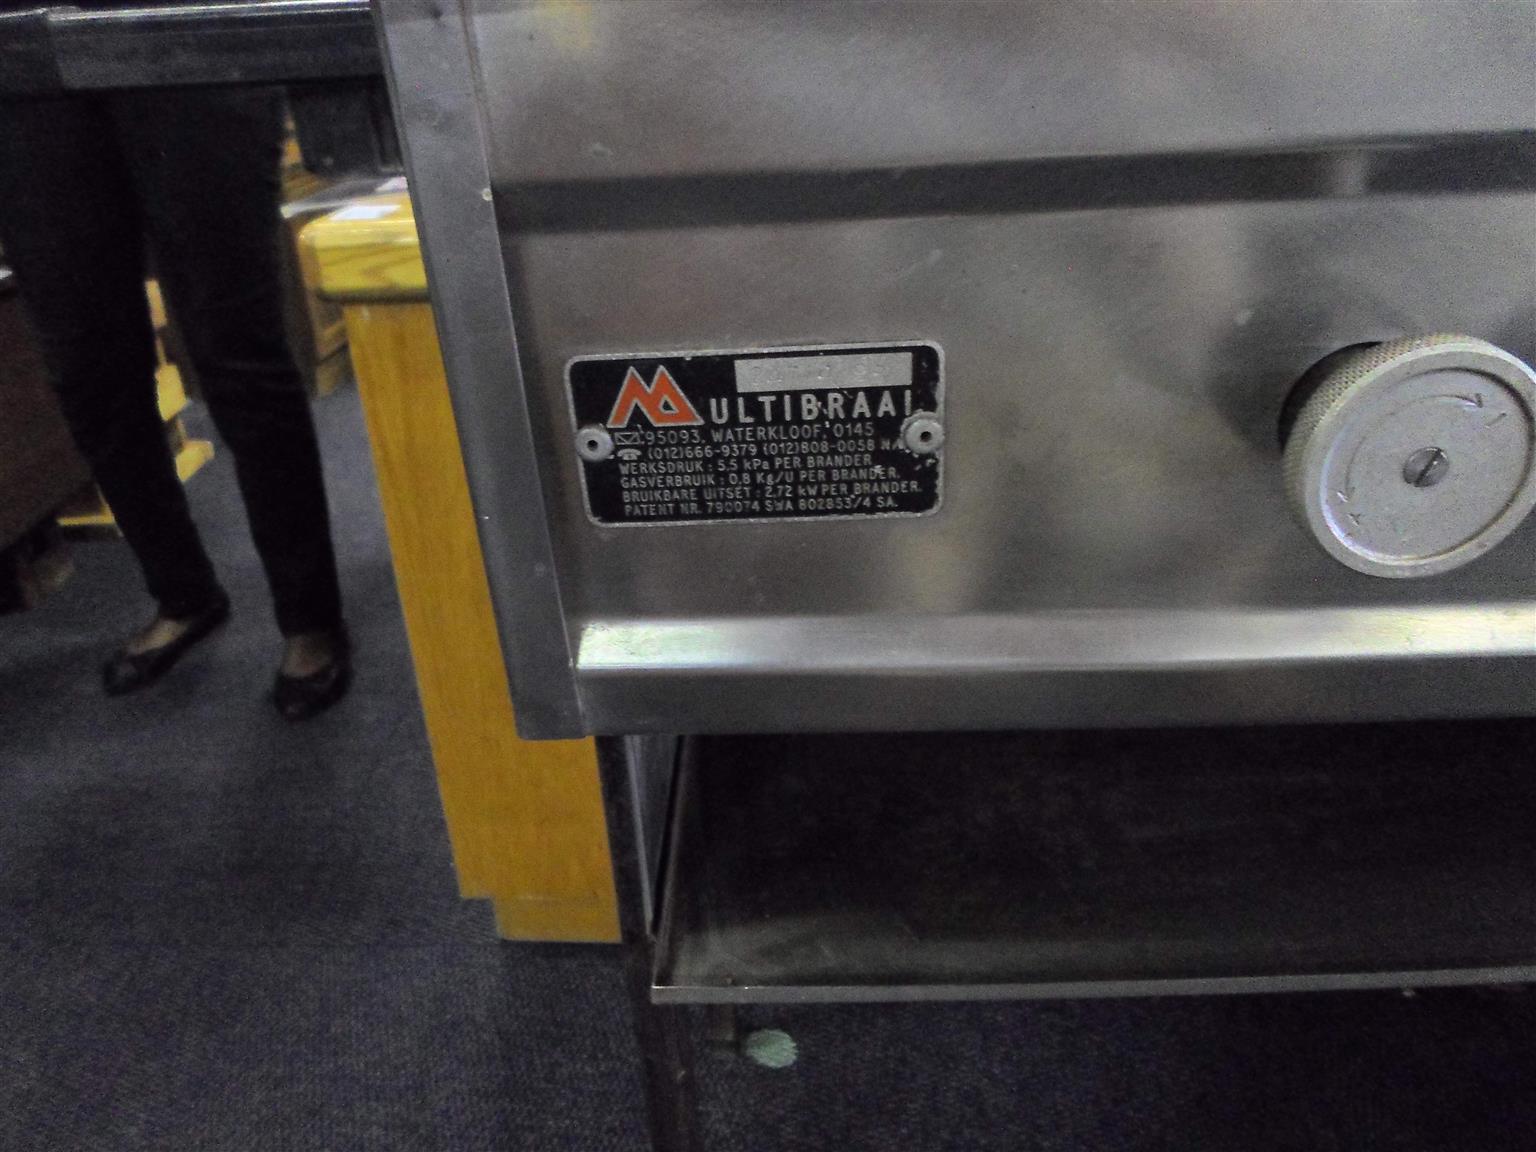 Multibraai Stainless Steel Gas Braai